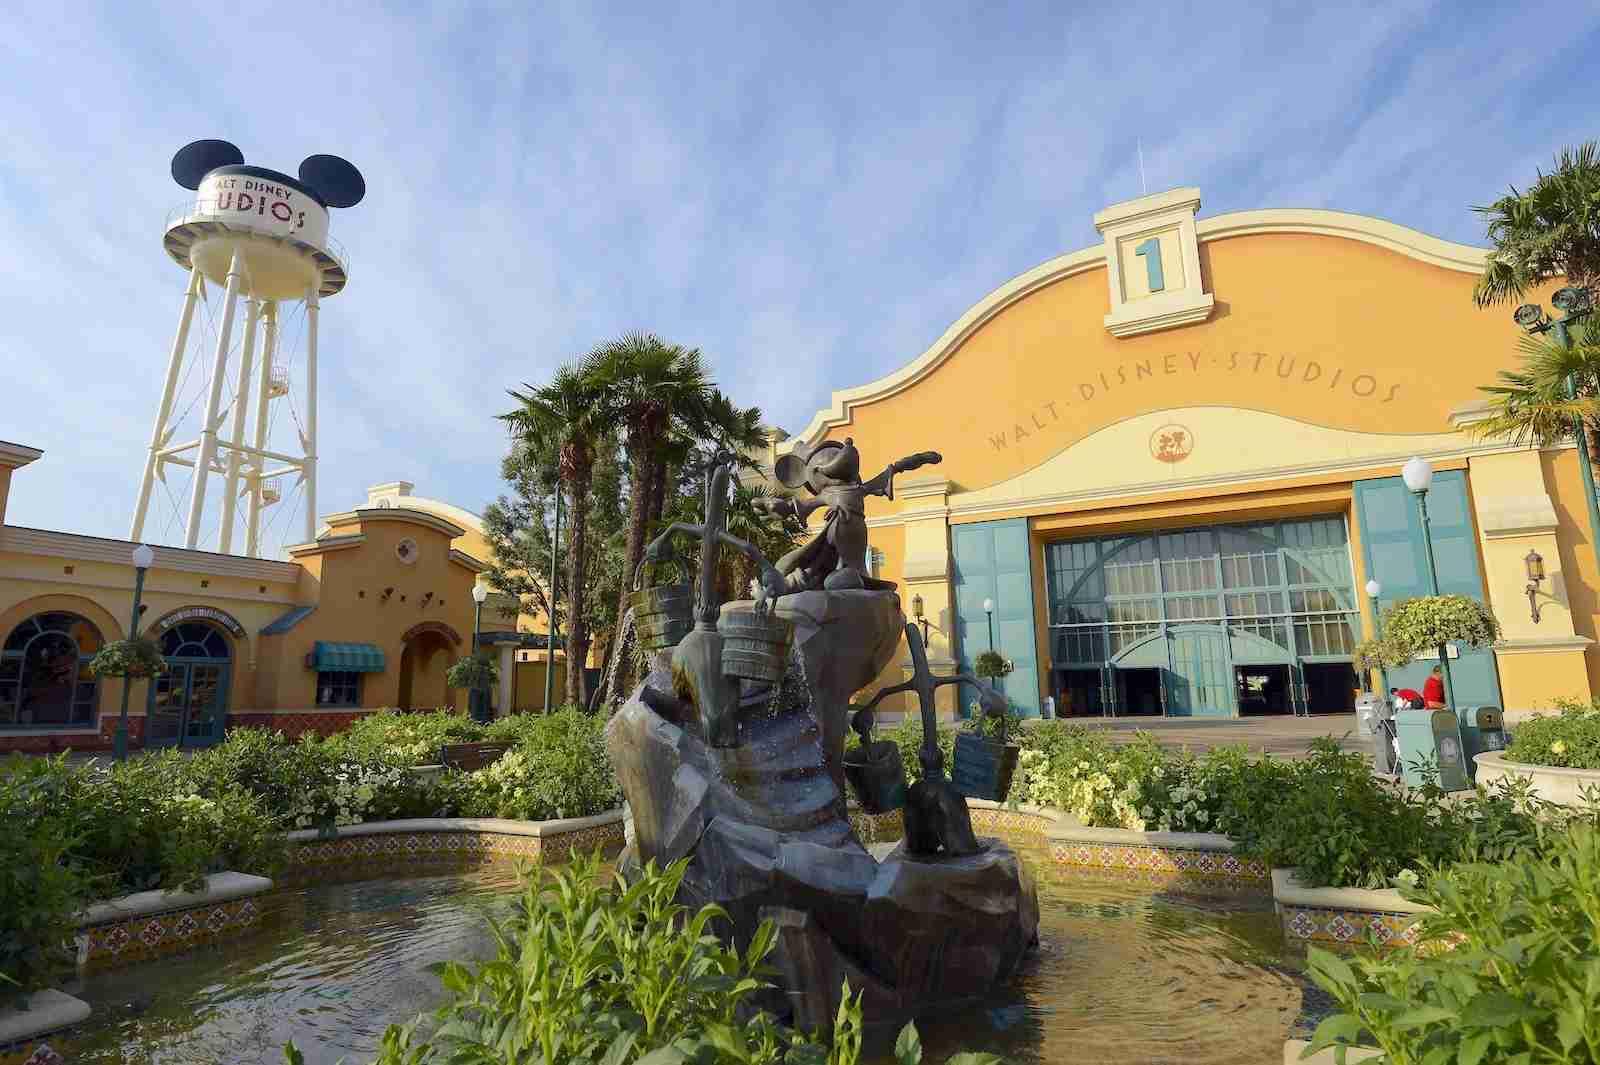 (Entrance of the Walt Disney Studios park at Disneyland Paris in Marne-la-Vallee. Photo by AFP PHOTO / Bertrand Guay)